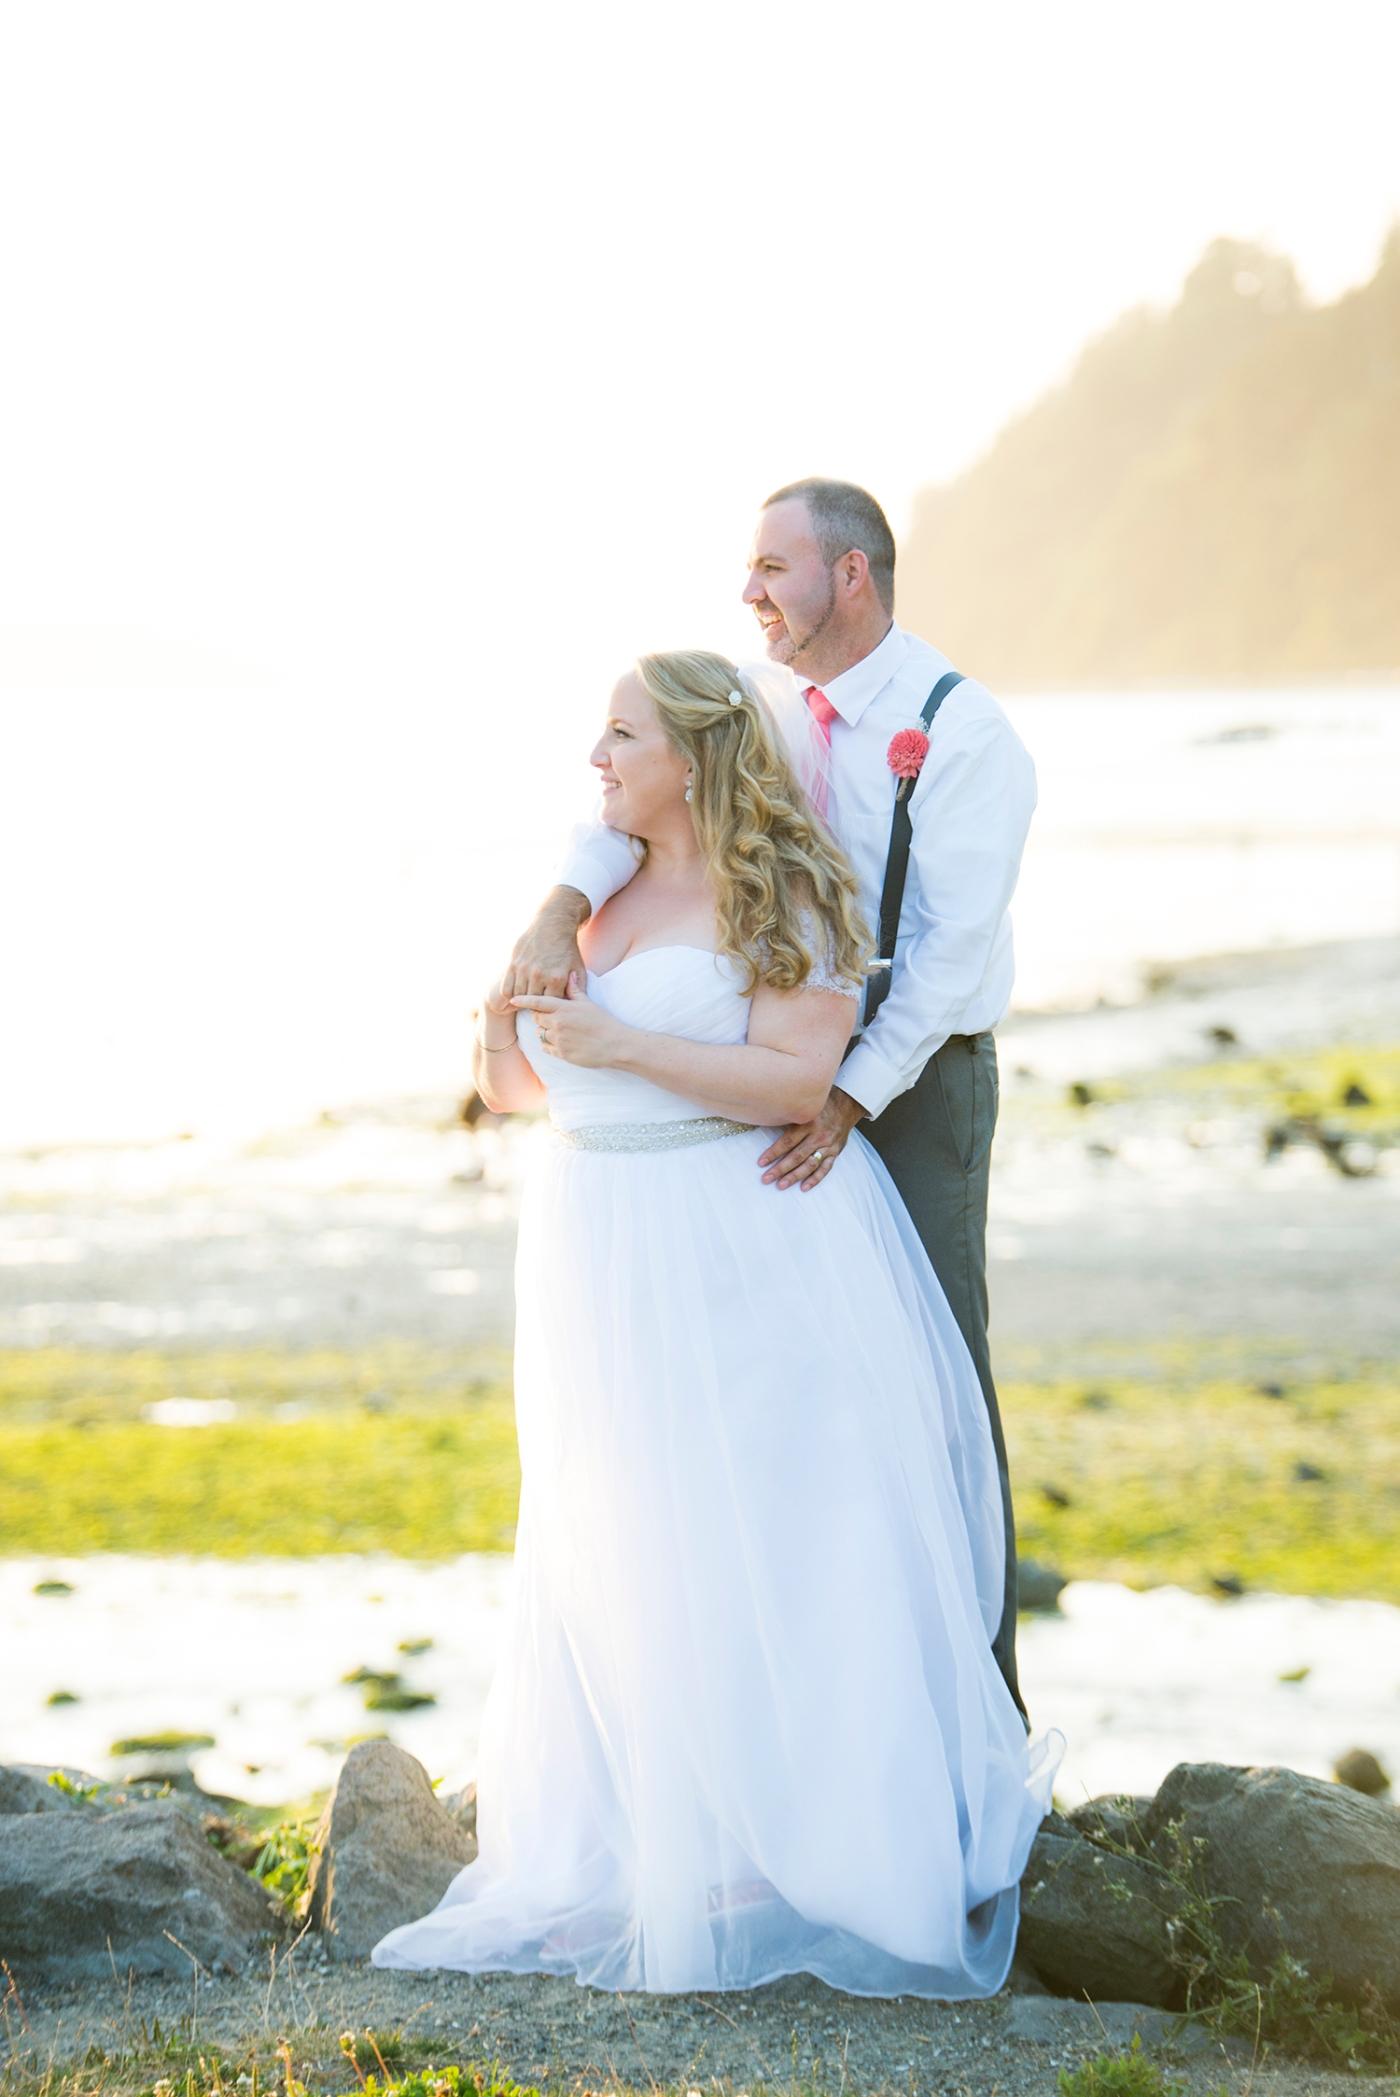 Jane_Speleers_photography_Kadie_and_Steve_2016_Des_Moines_Marina_WeddingDSC_2375